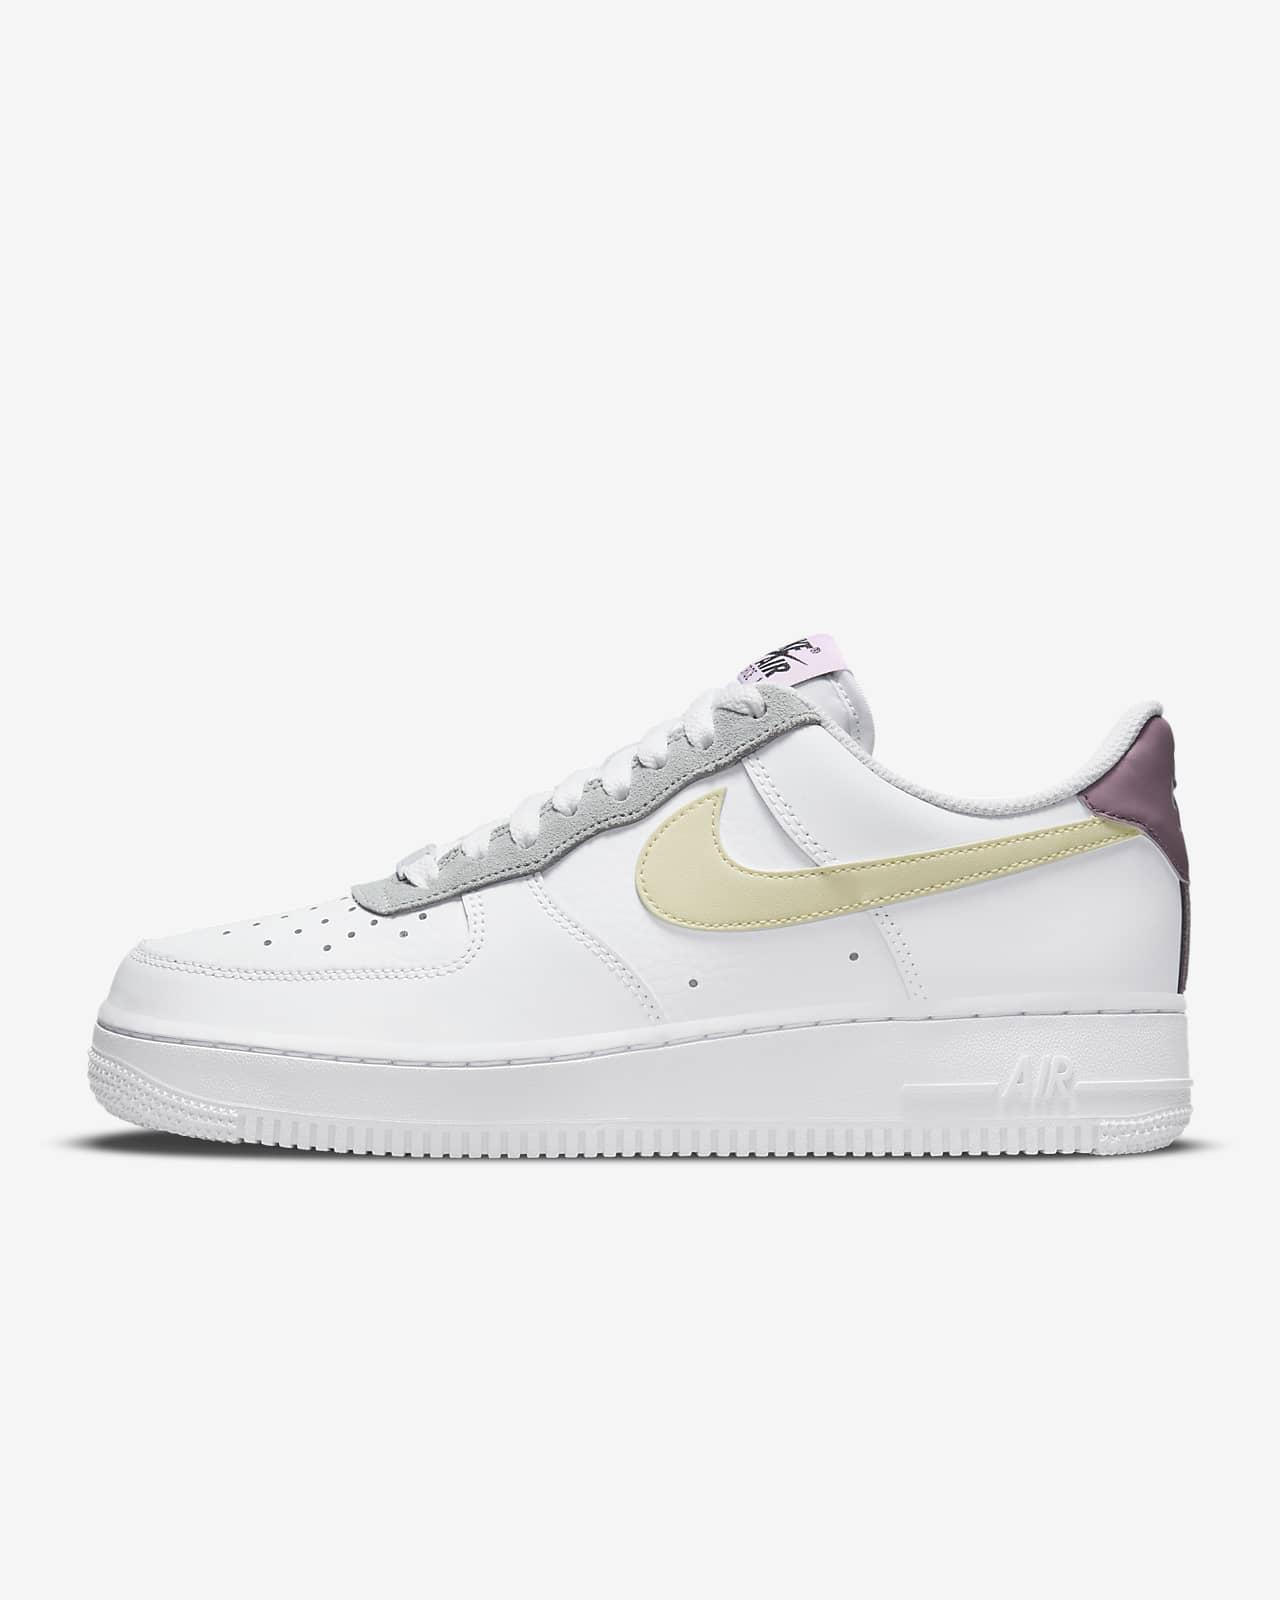 Nike Air Force 1 '07 Essential Women's Shoes. Nike LU